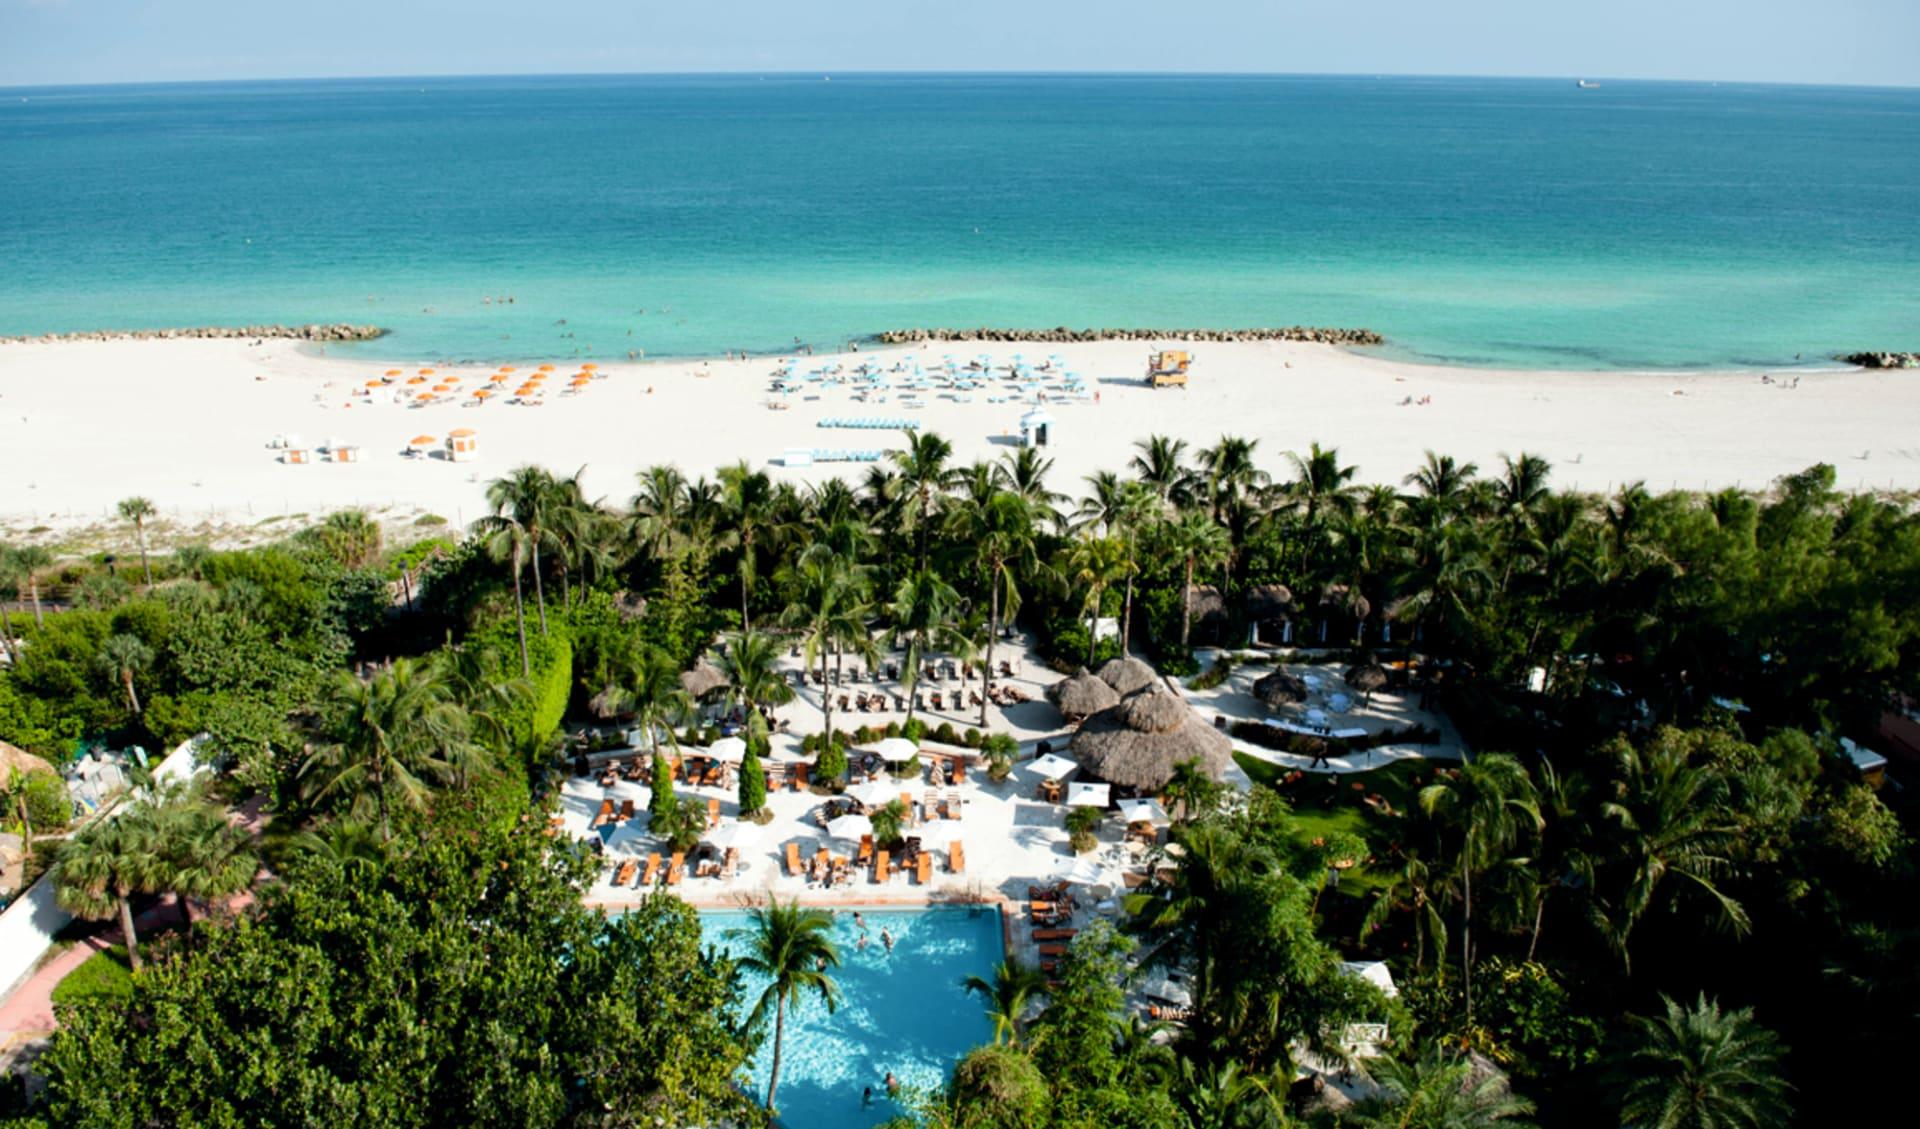 The Palms in Miami Beach:  The Palms - Gartenanlage, Palmen, Strand